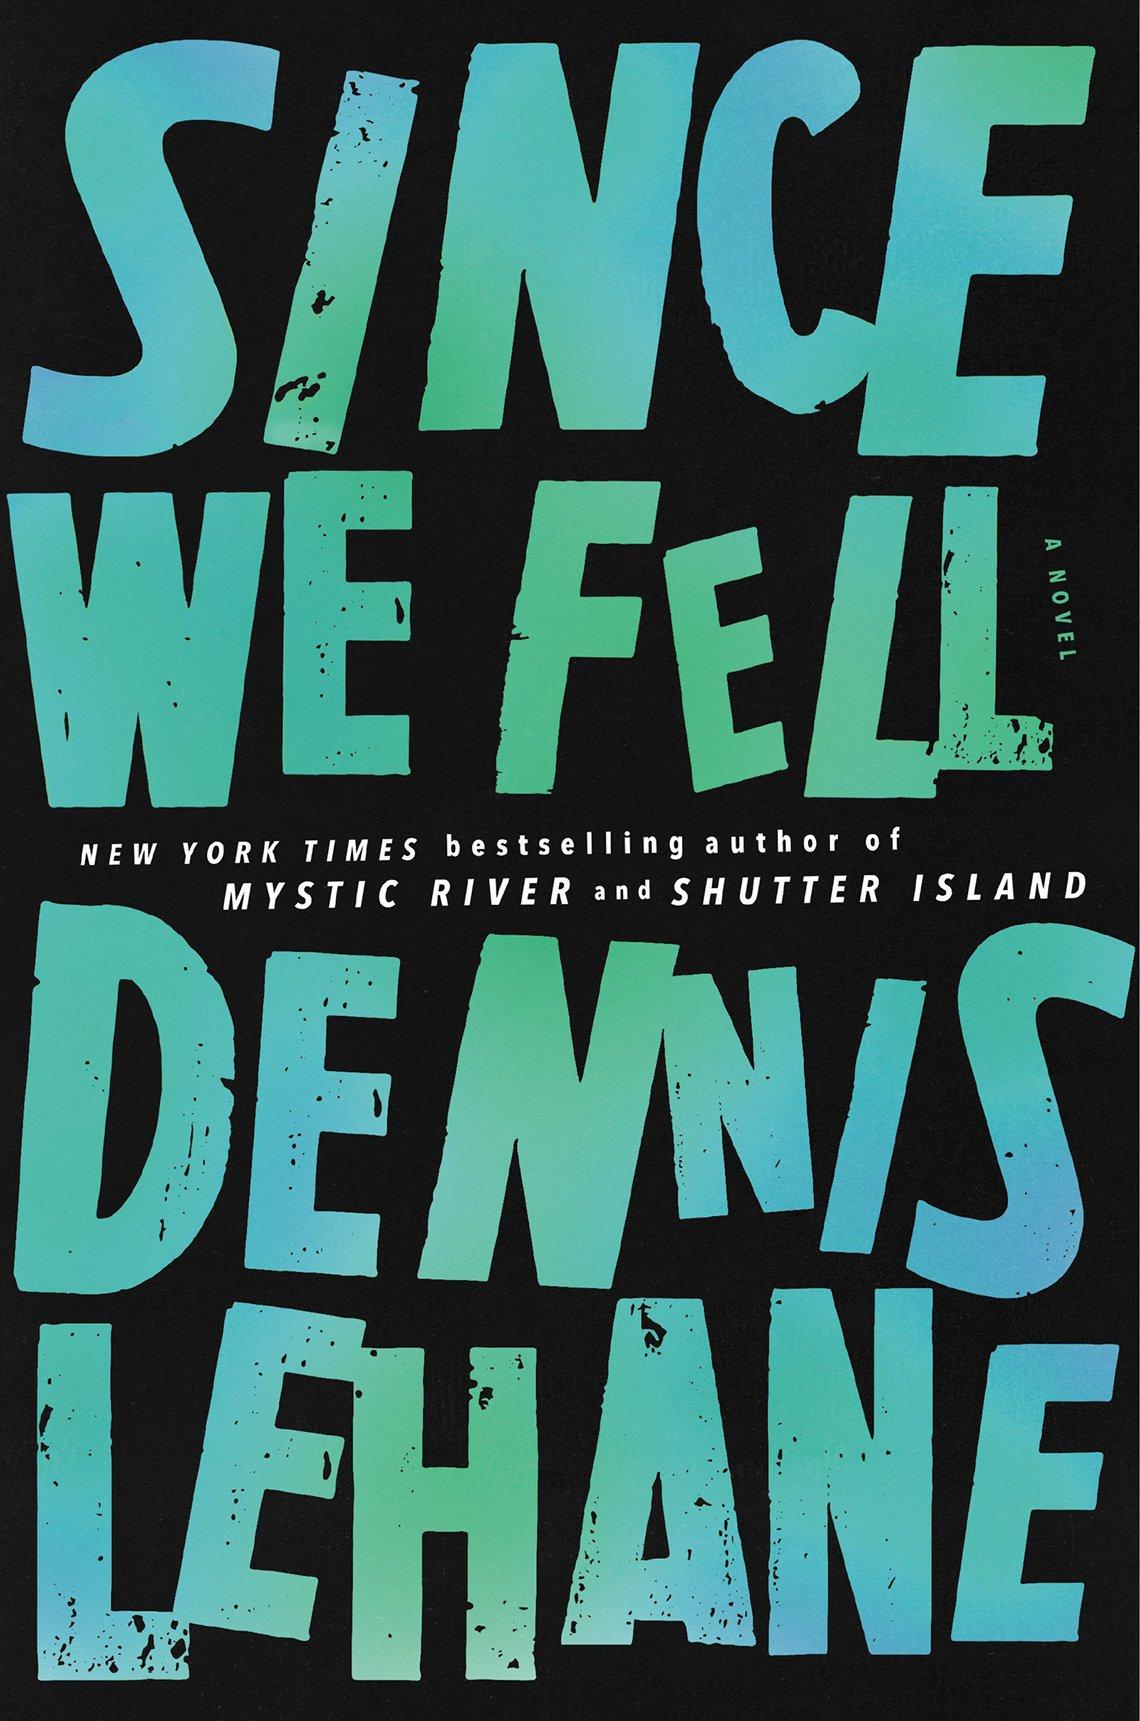 Since We Fell, by Dennis Lehane